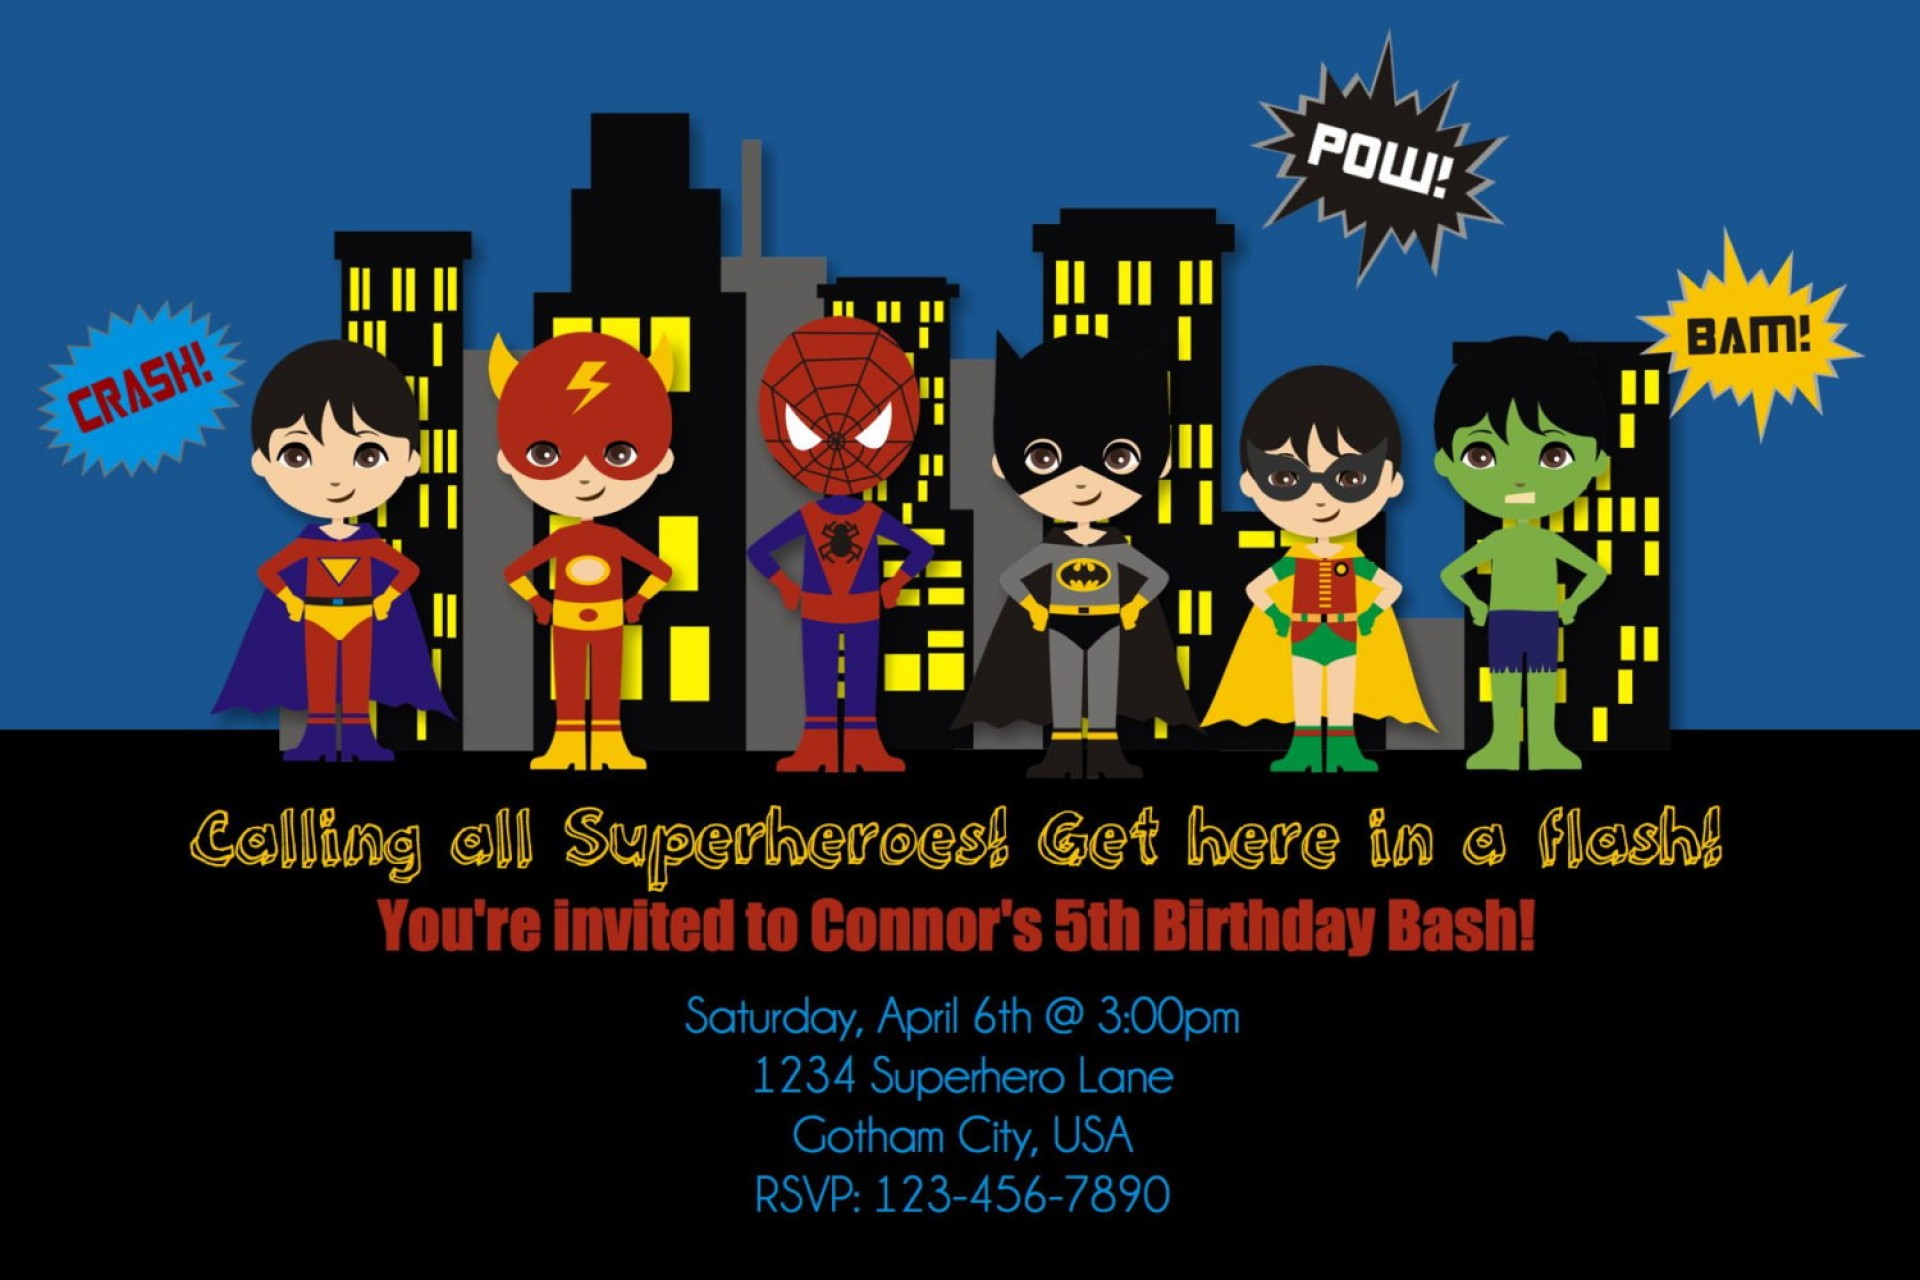 008 Exceptional Editable Superhero Invitation Template Free Concept 1920